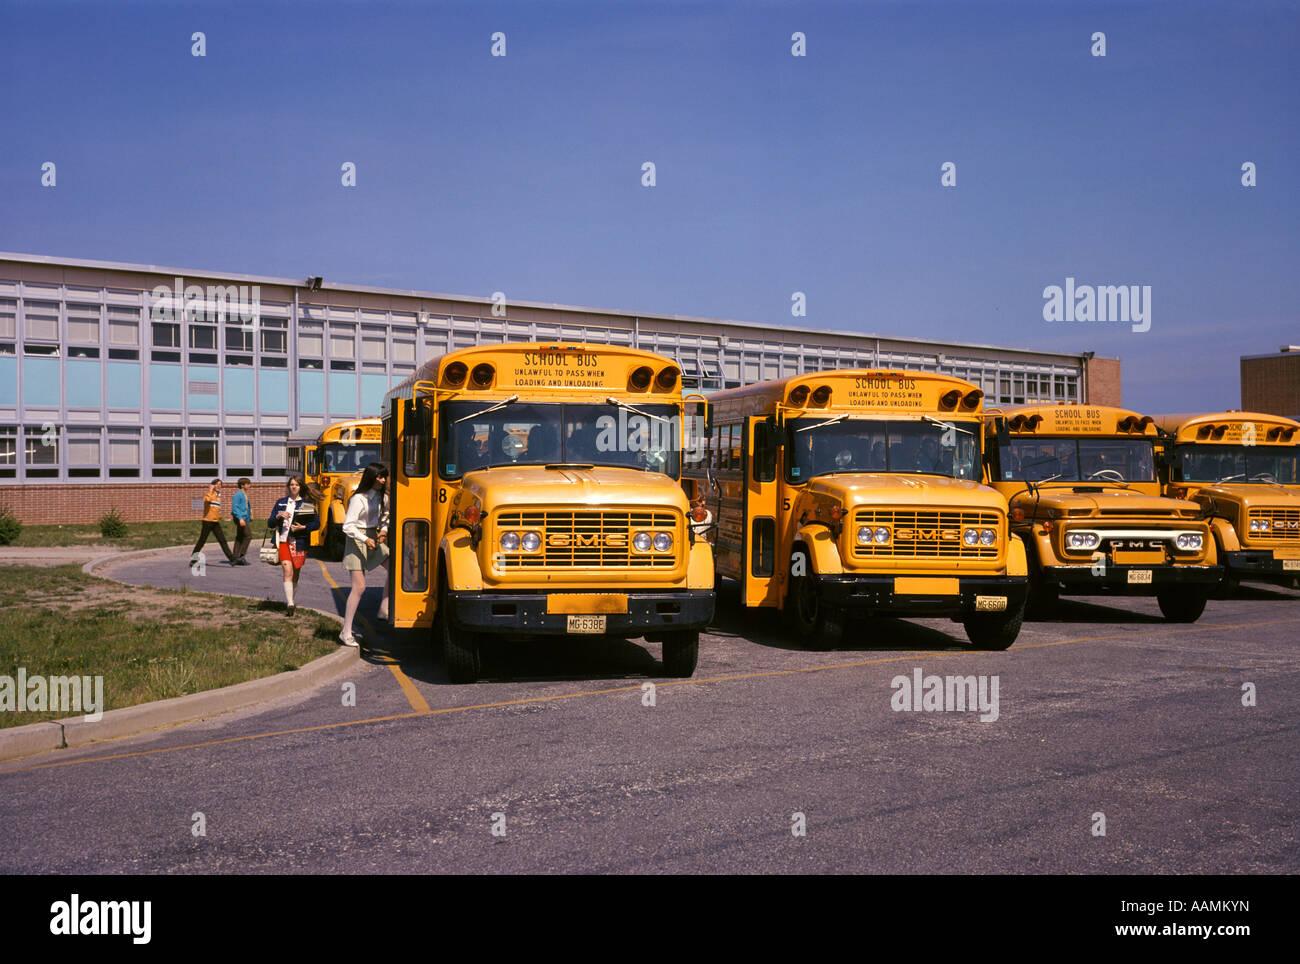 1970 SECONDAIRE BOARDING SCHOOL BUS Photo Stock